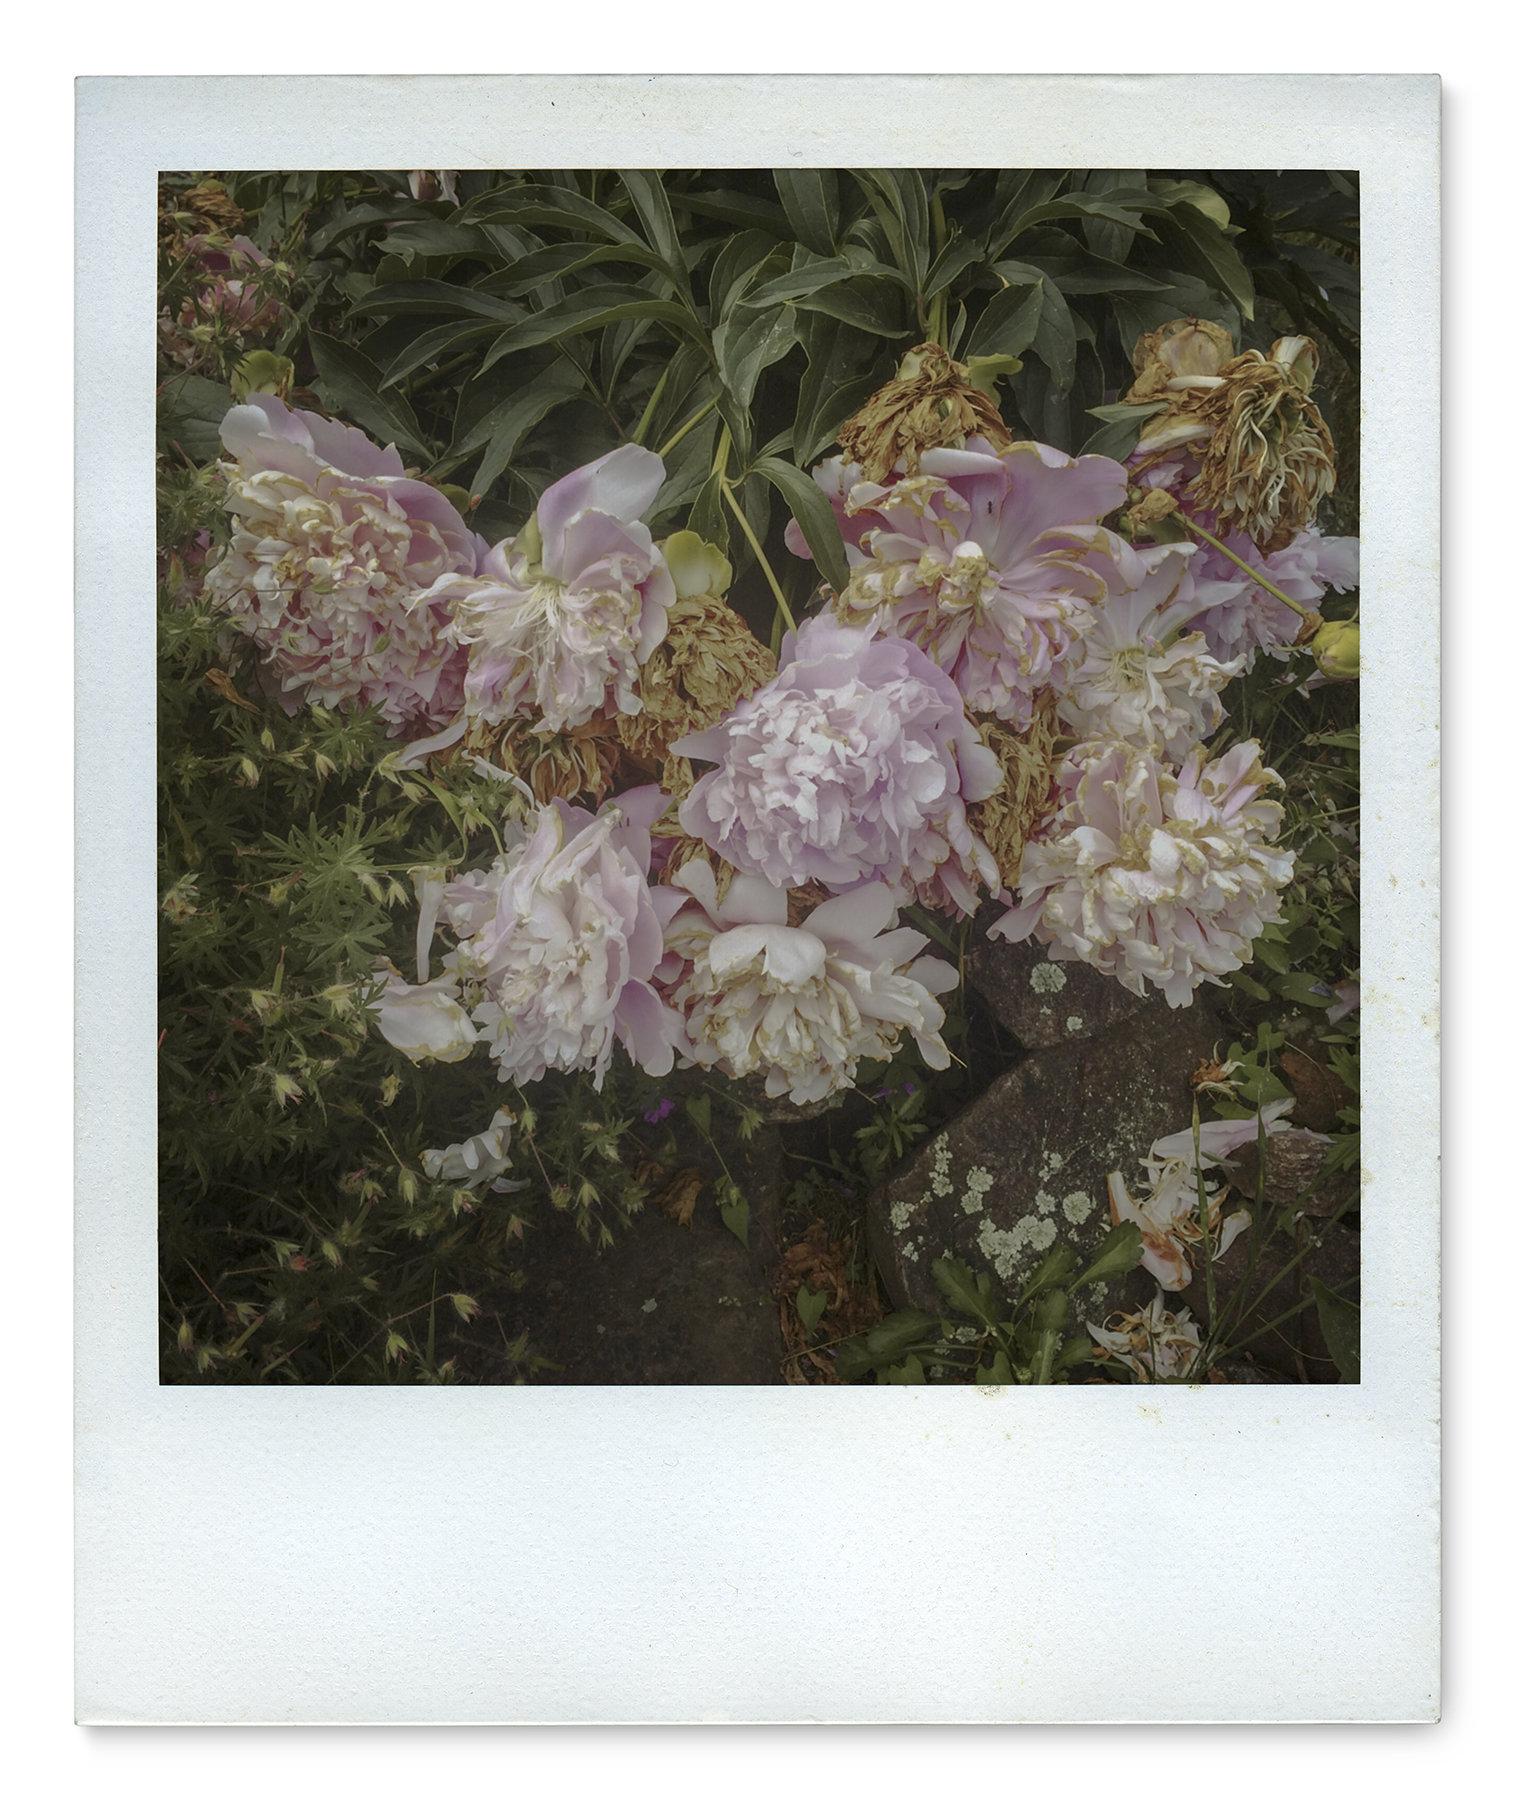 020_Polaroid SX70_IMG_2430.jpg